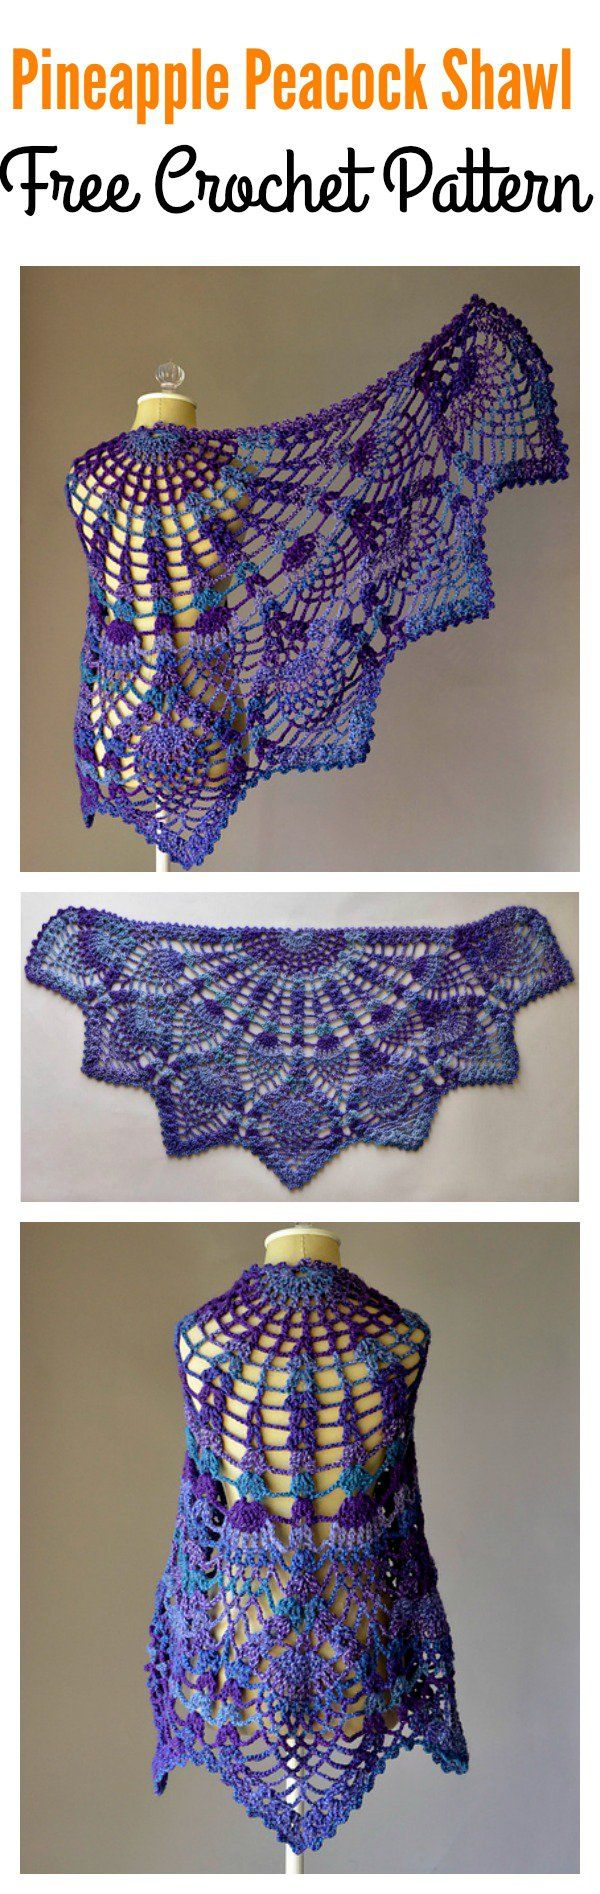 Pineapple Peacock Shawl Free Crochet Pattern | El pavo real, Pavos ...